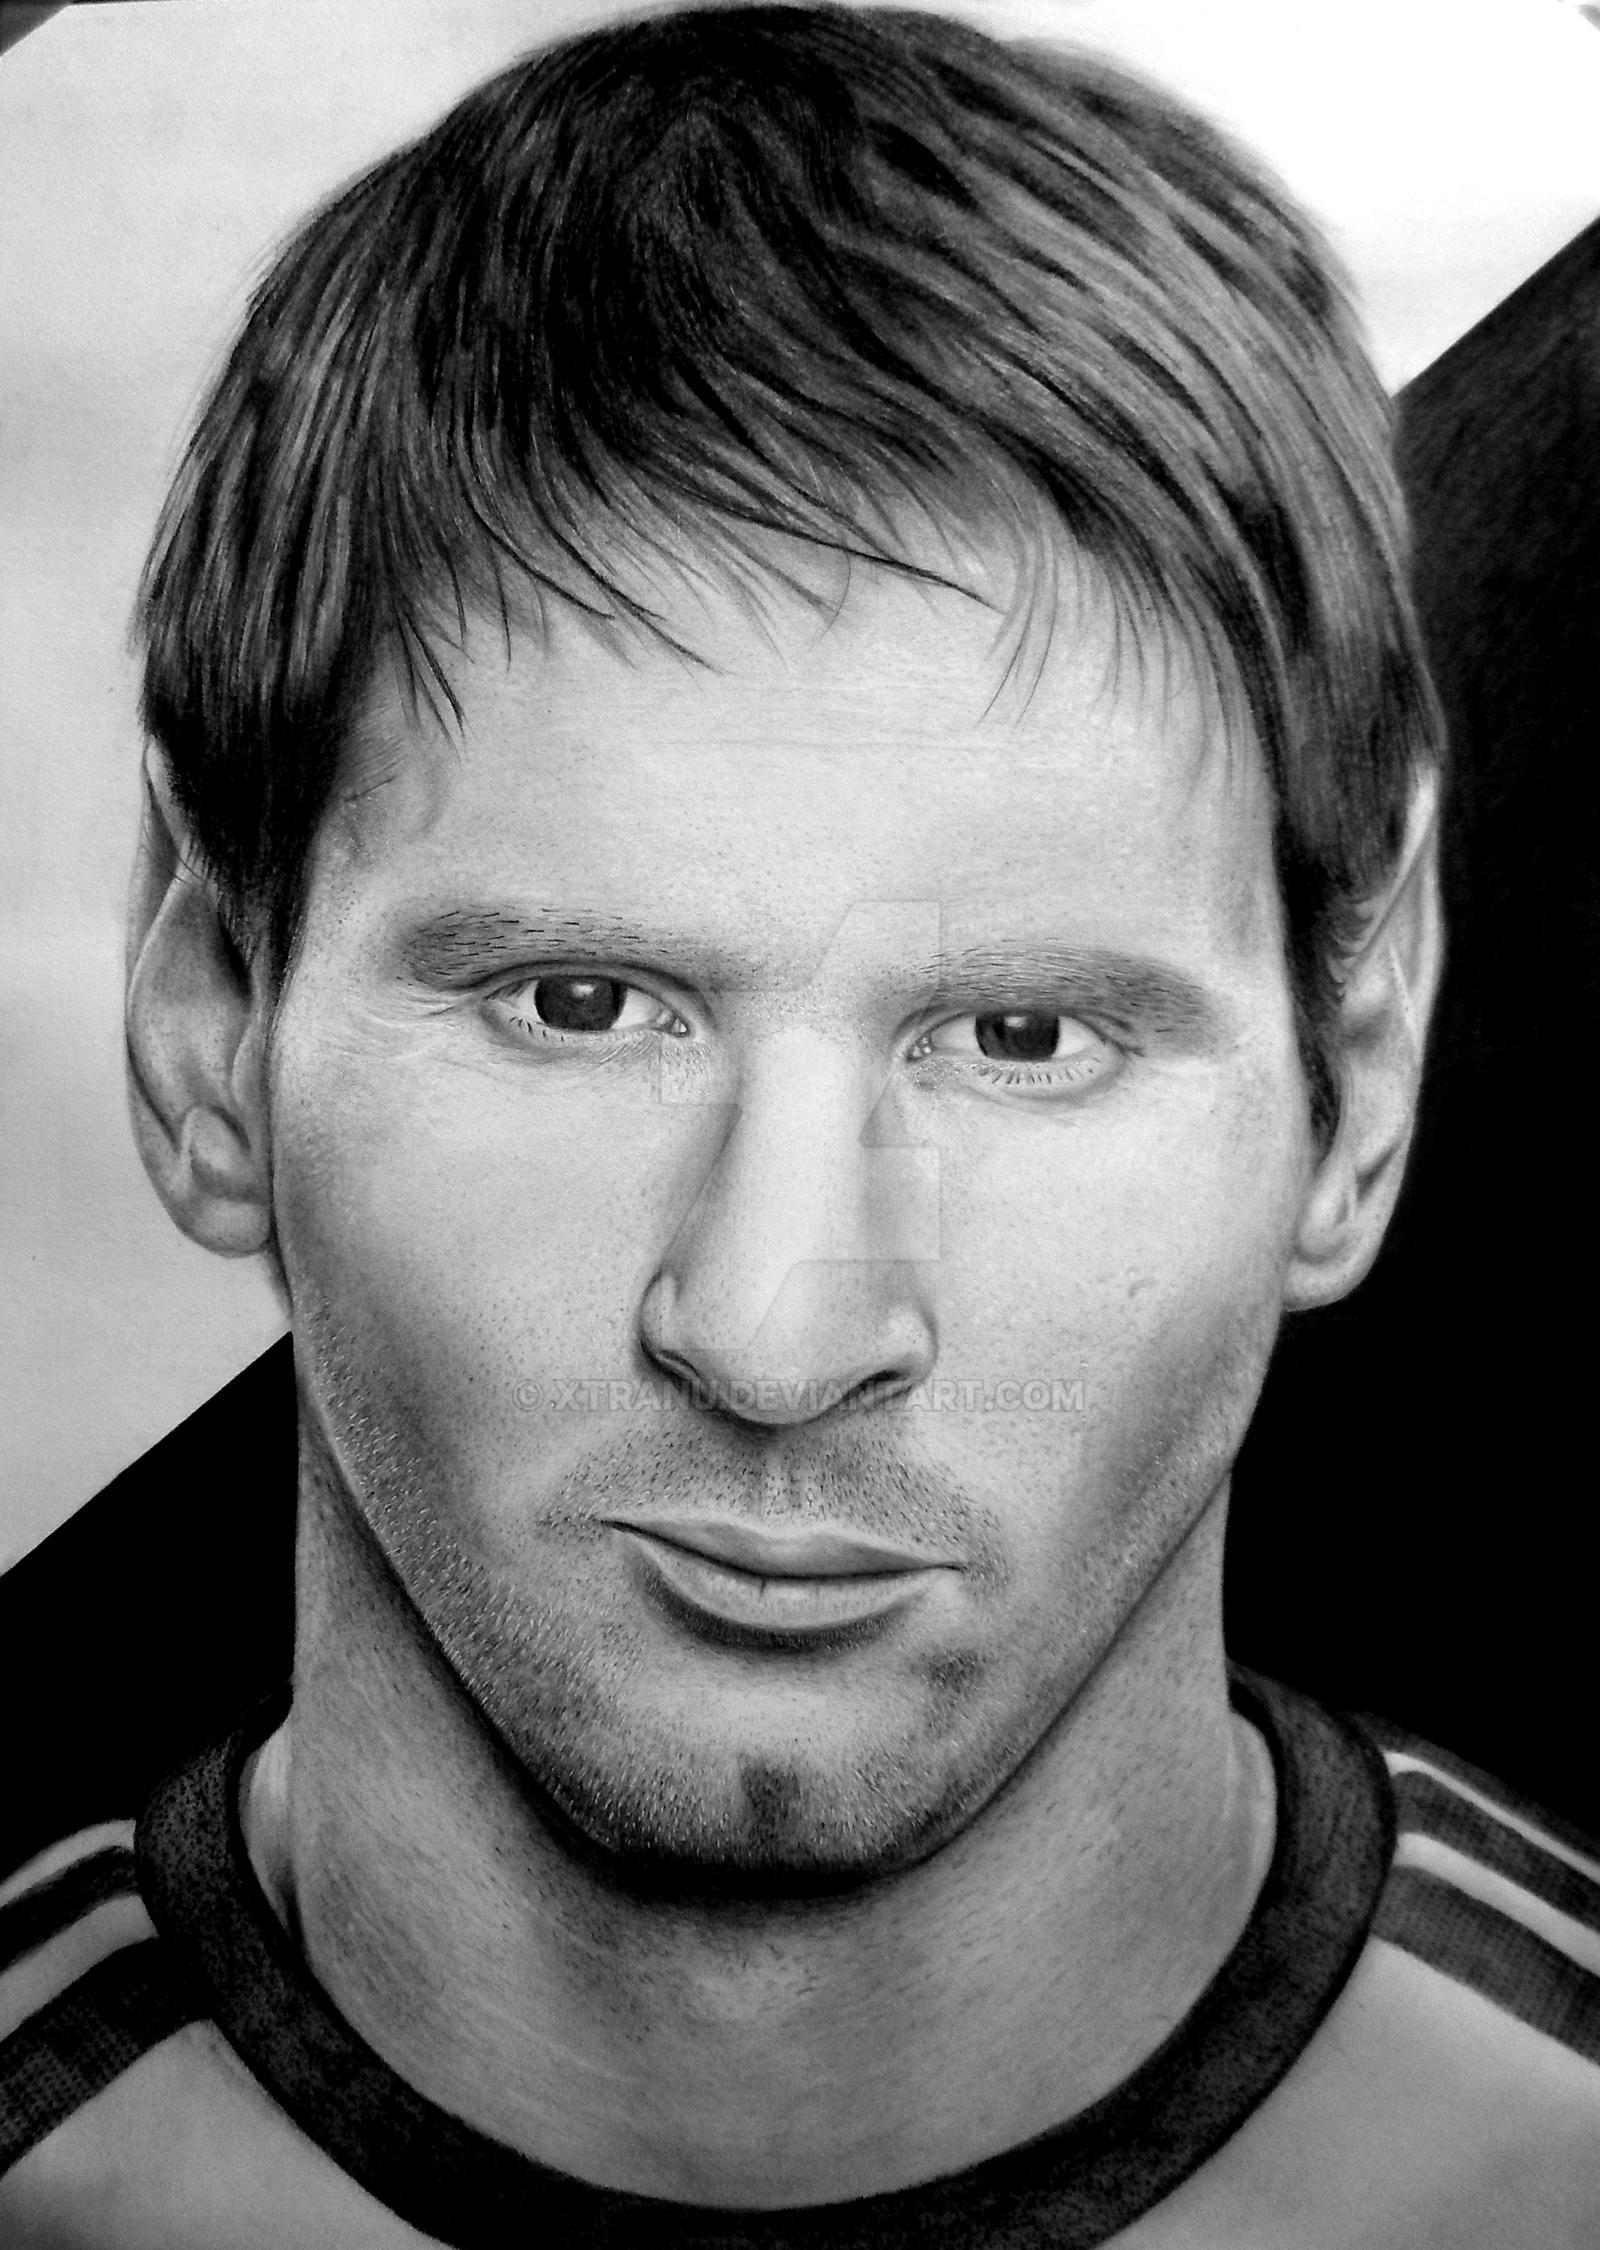 Messi by Xtranu on DeviantArt